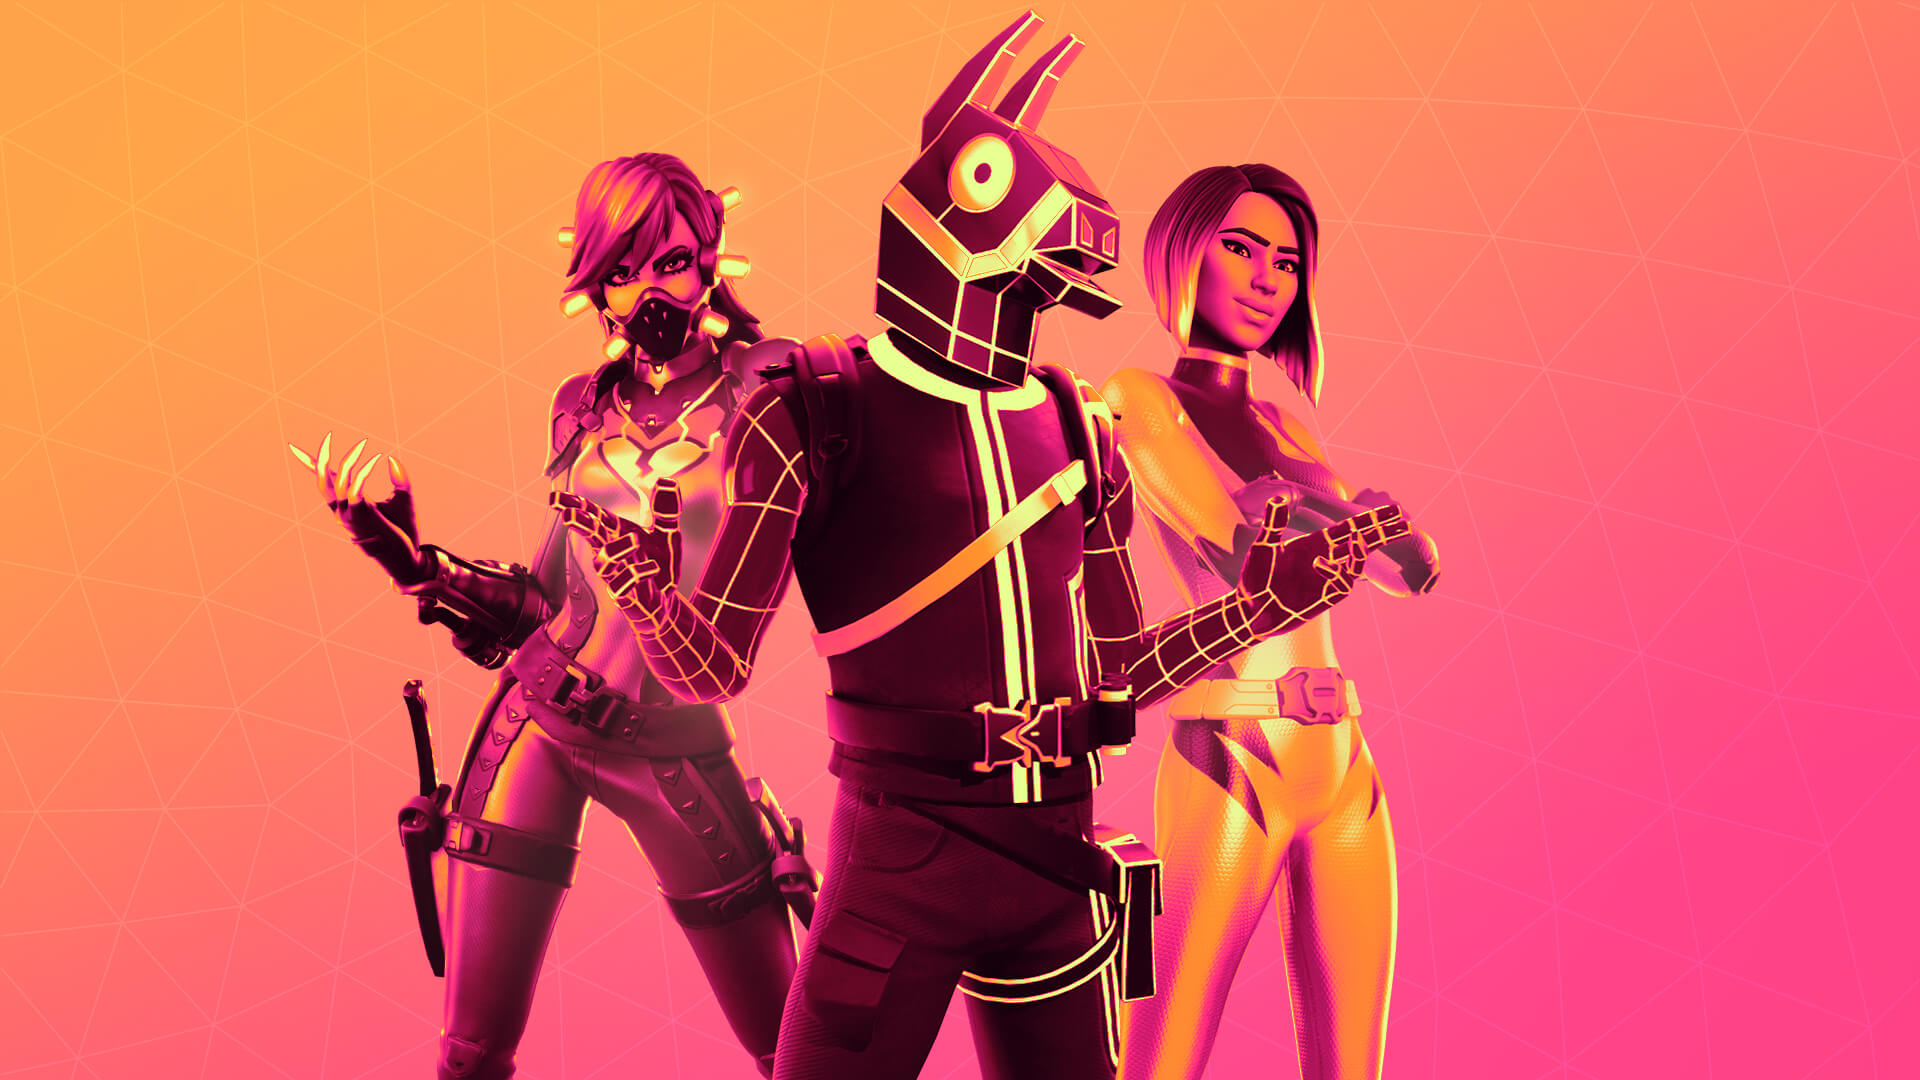 Best Fortnite Cast Fortnite Chapter 2 Season 7 Competitive Update